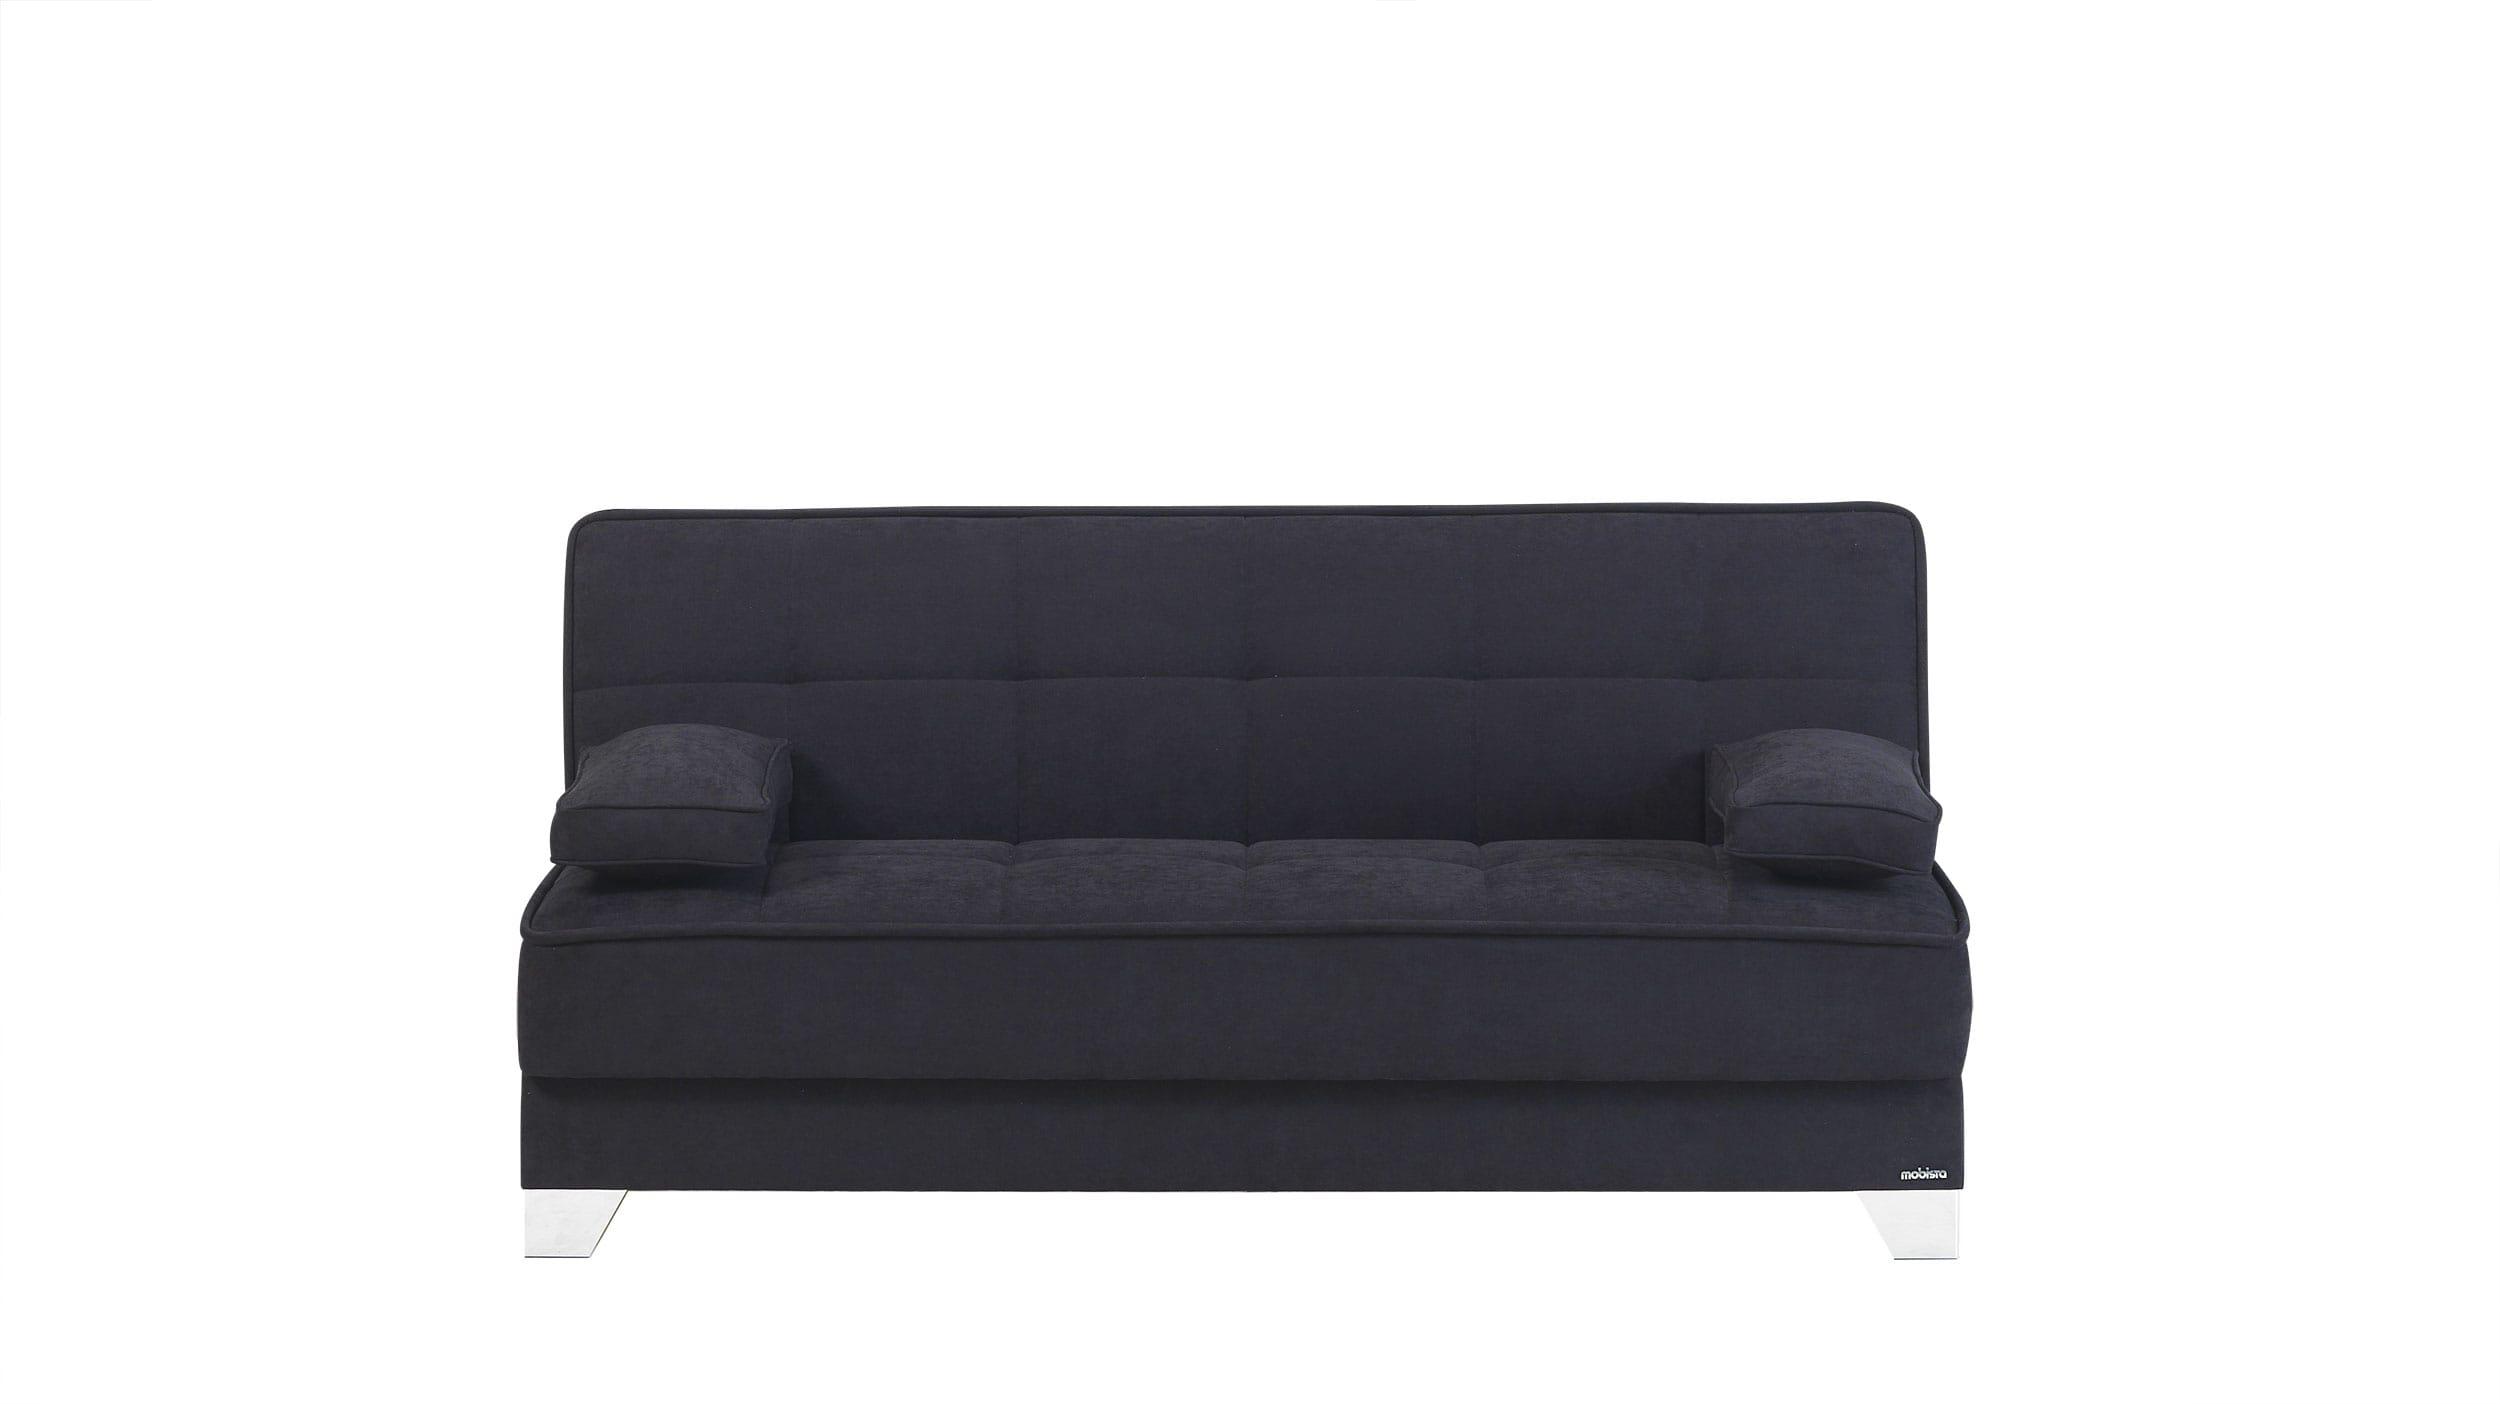 Nexo Carisma Black Sofa Bed by Mobista